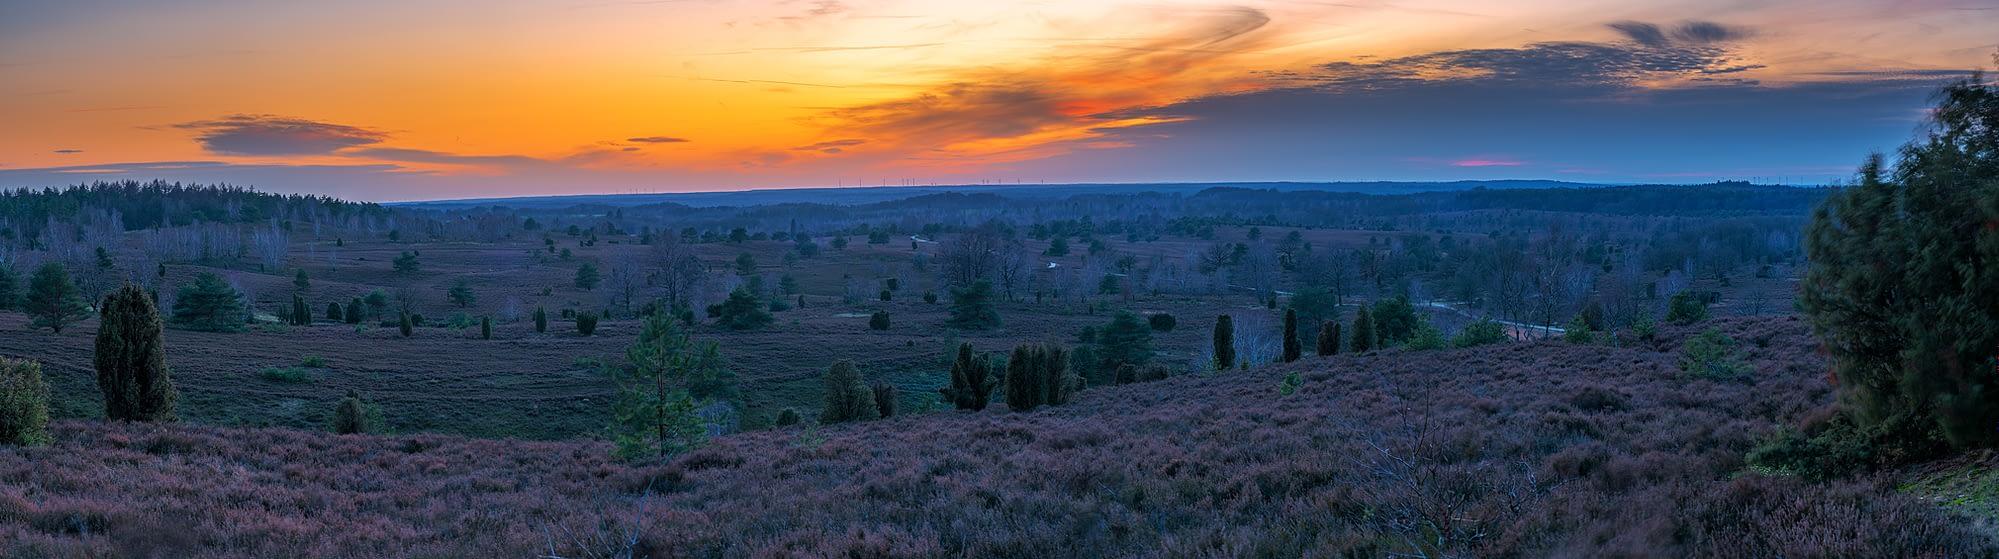 Wilseder Berg Lüneburger Heide zum Sonnenuntergang Panorama